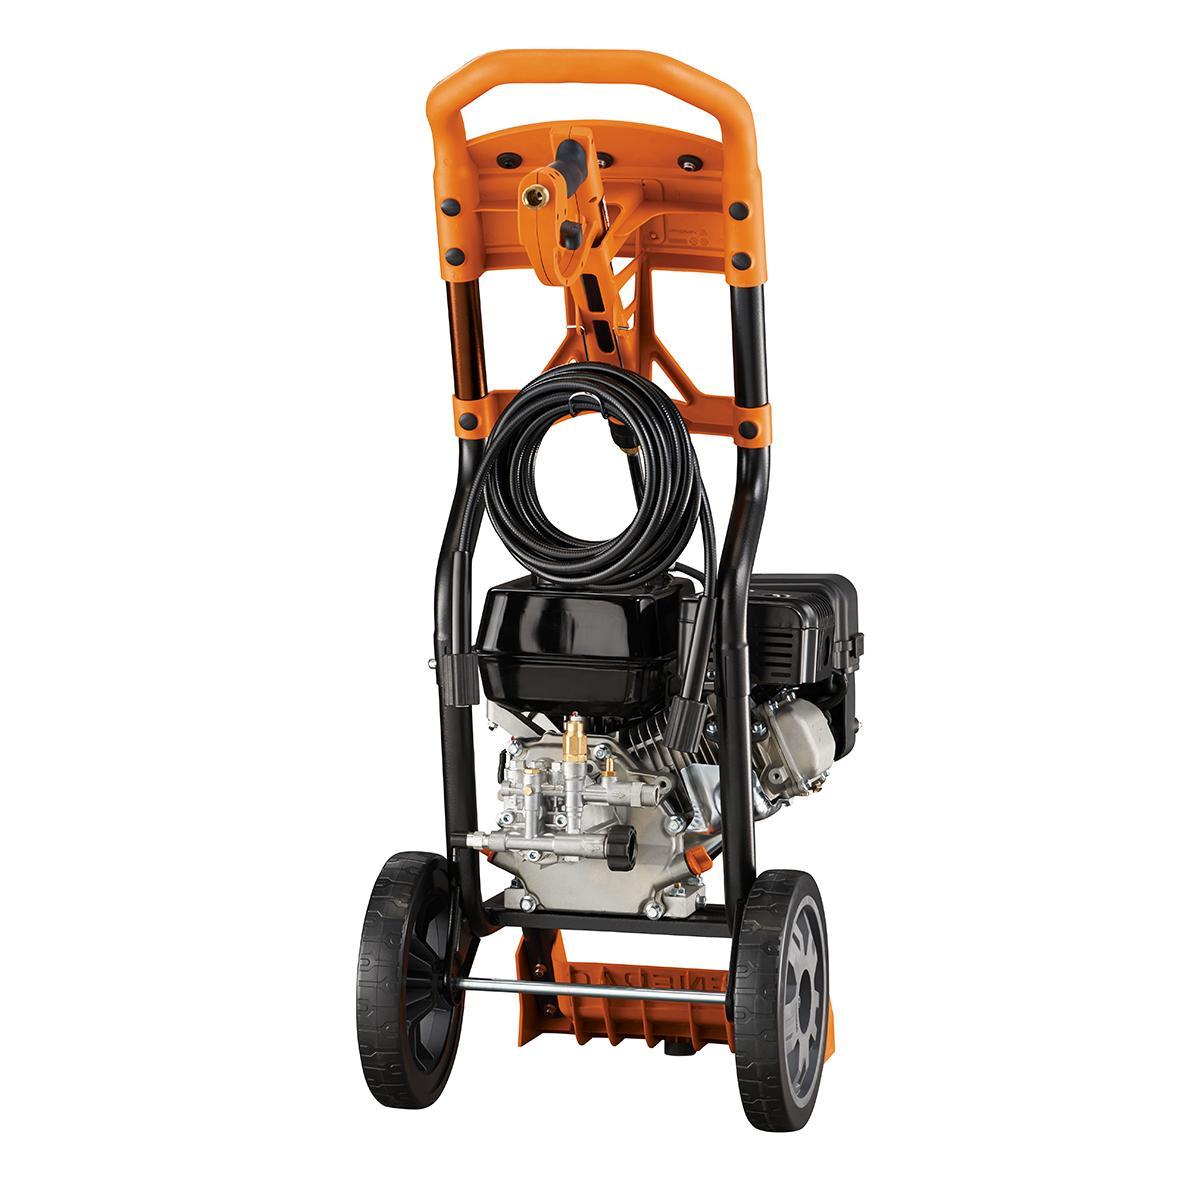 Amazon Com Generac 6595 2 500 Psi 2 3 Gpm 196cc Ohv Gas